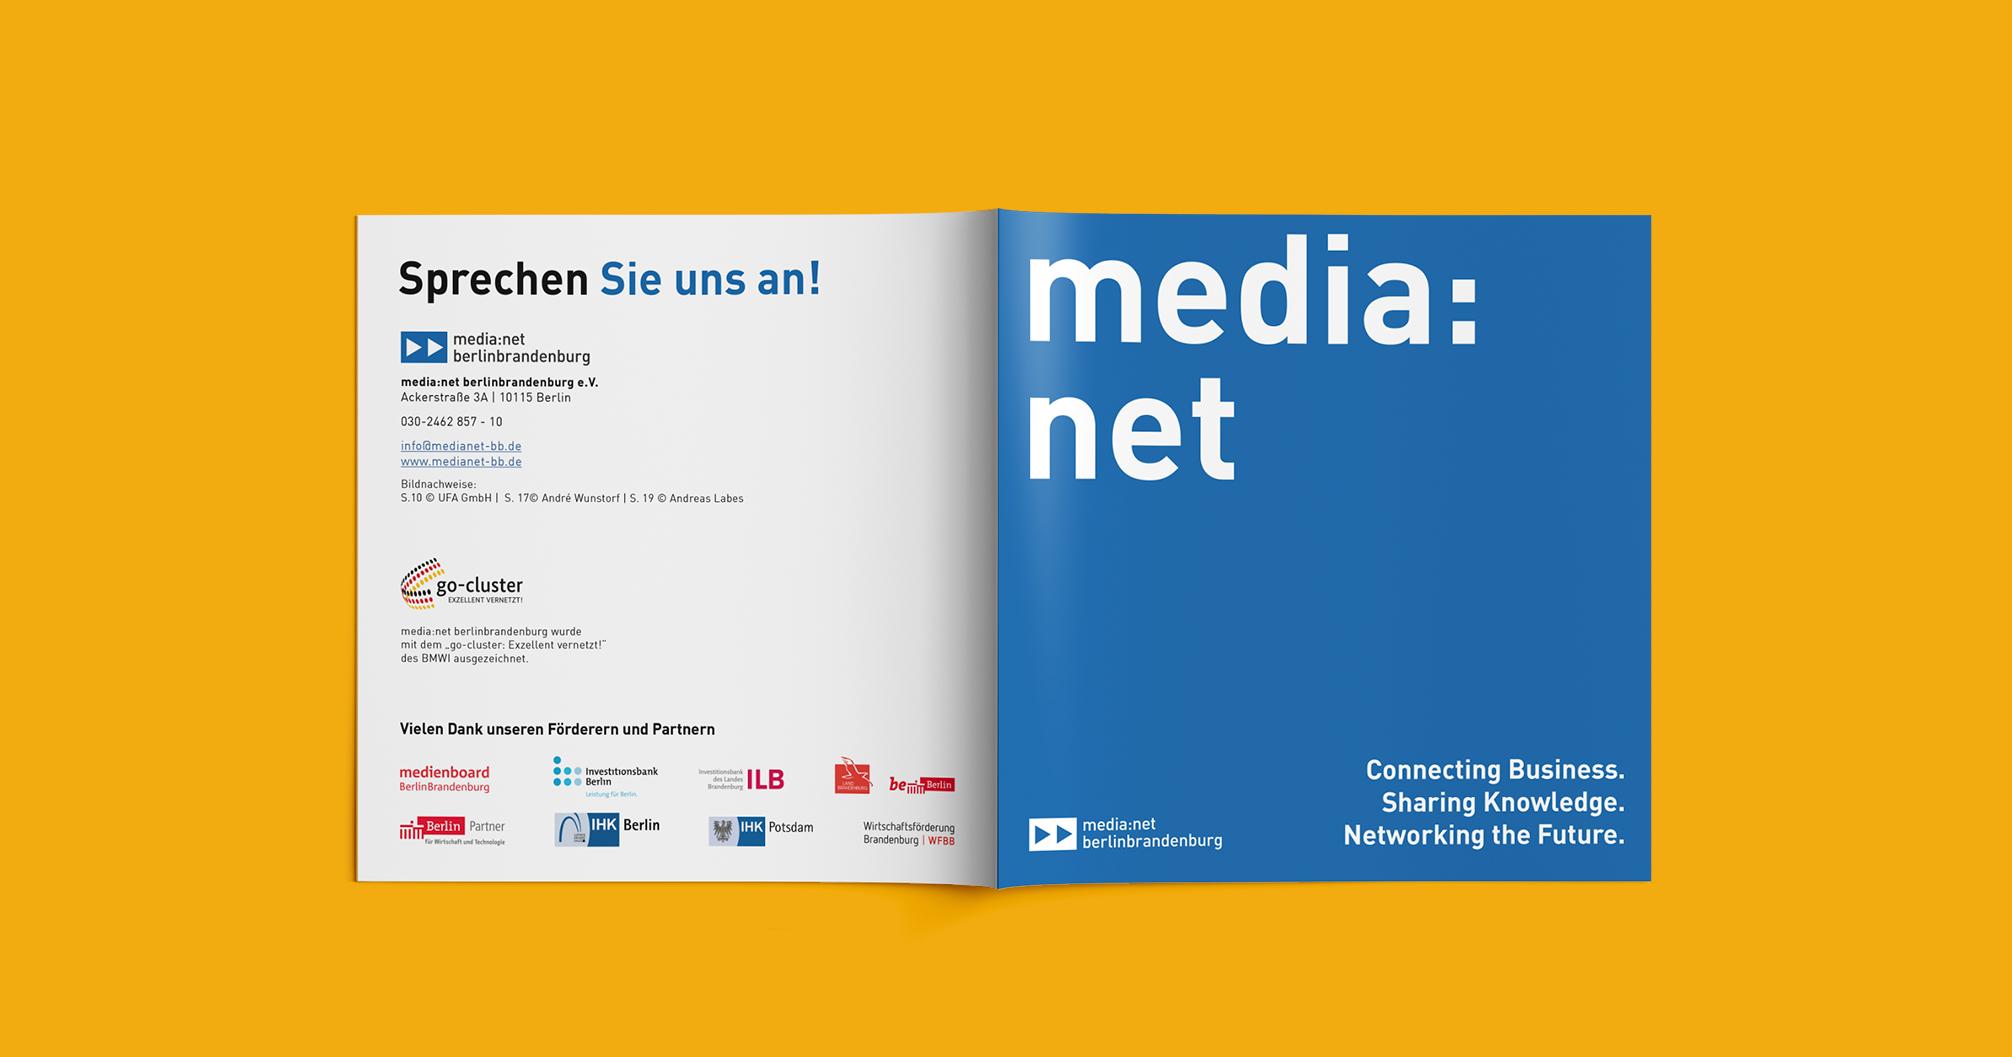 Media net berlinbrandenburg Image Booklet | Redesign Corporate Design - Cover